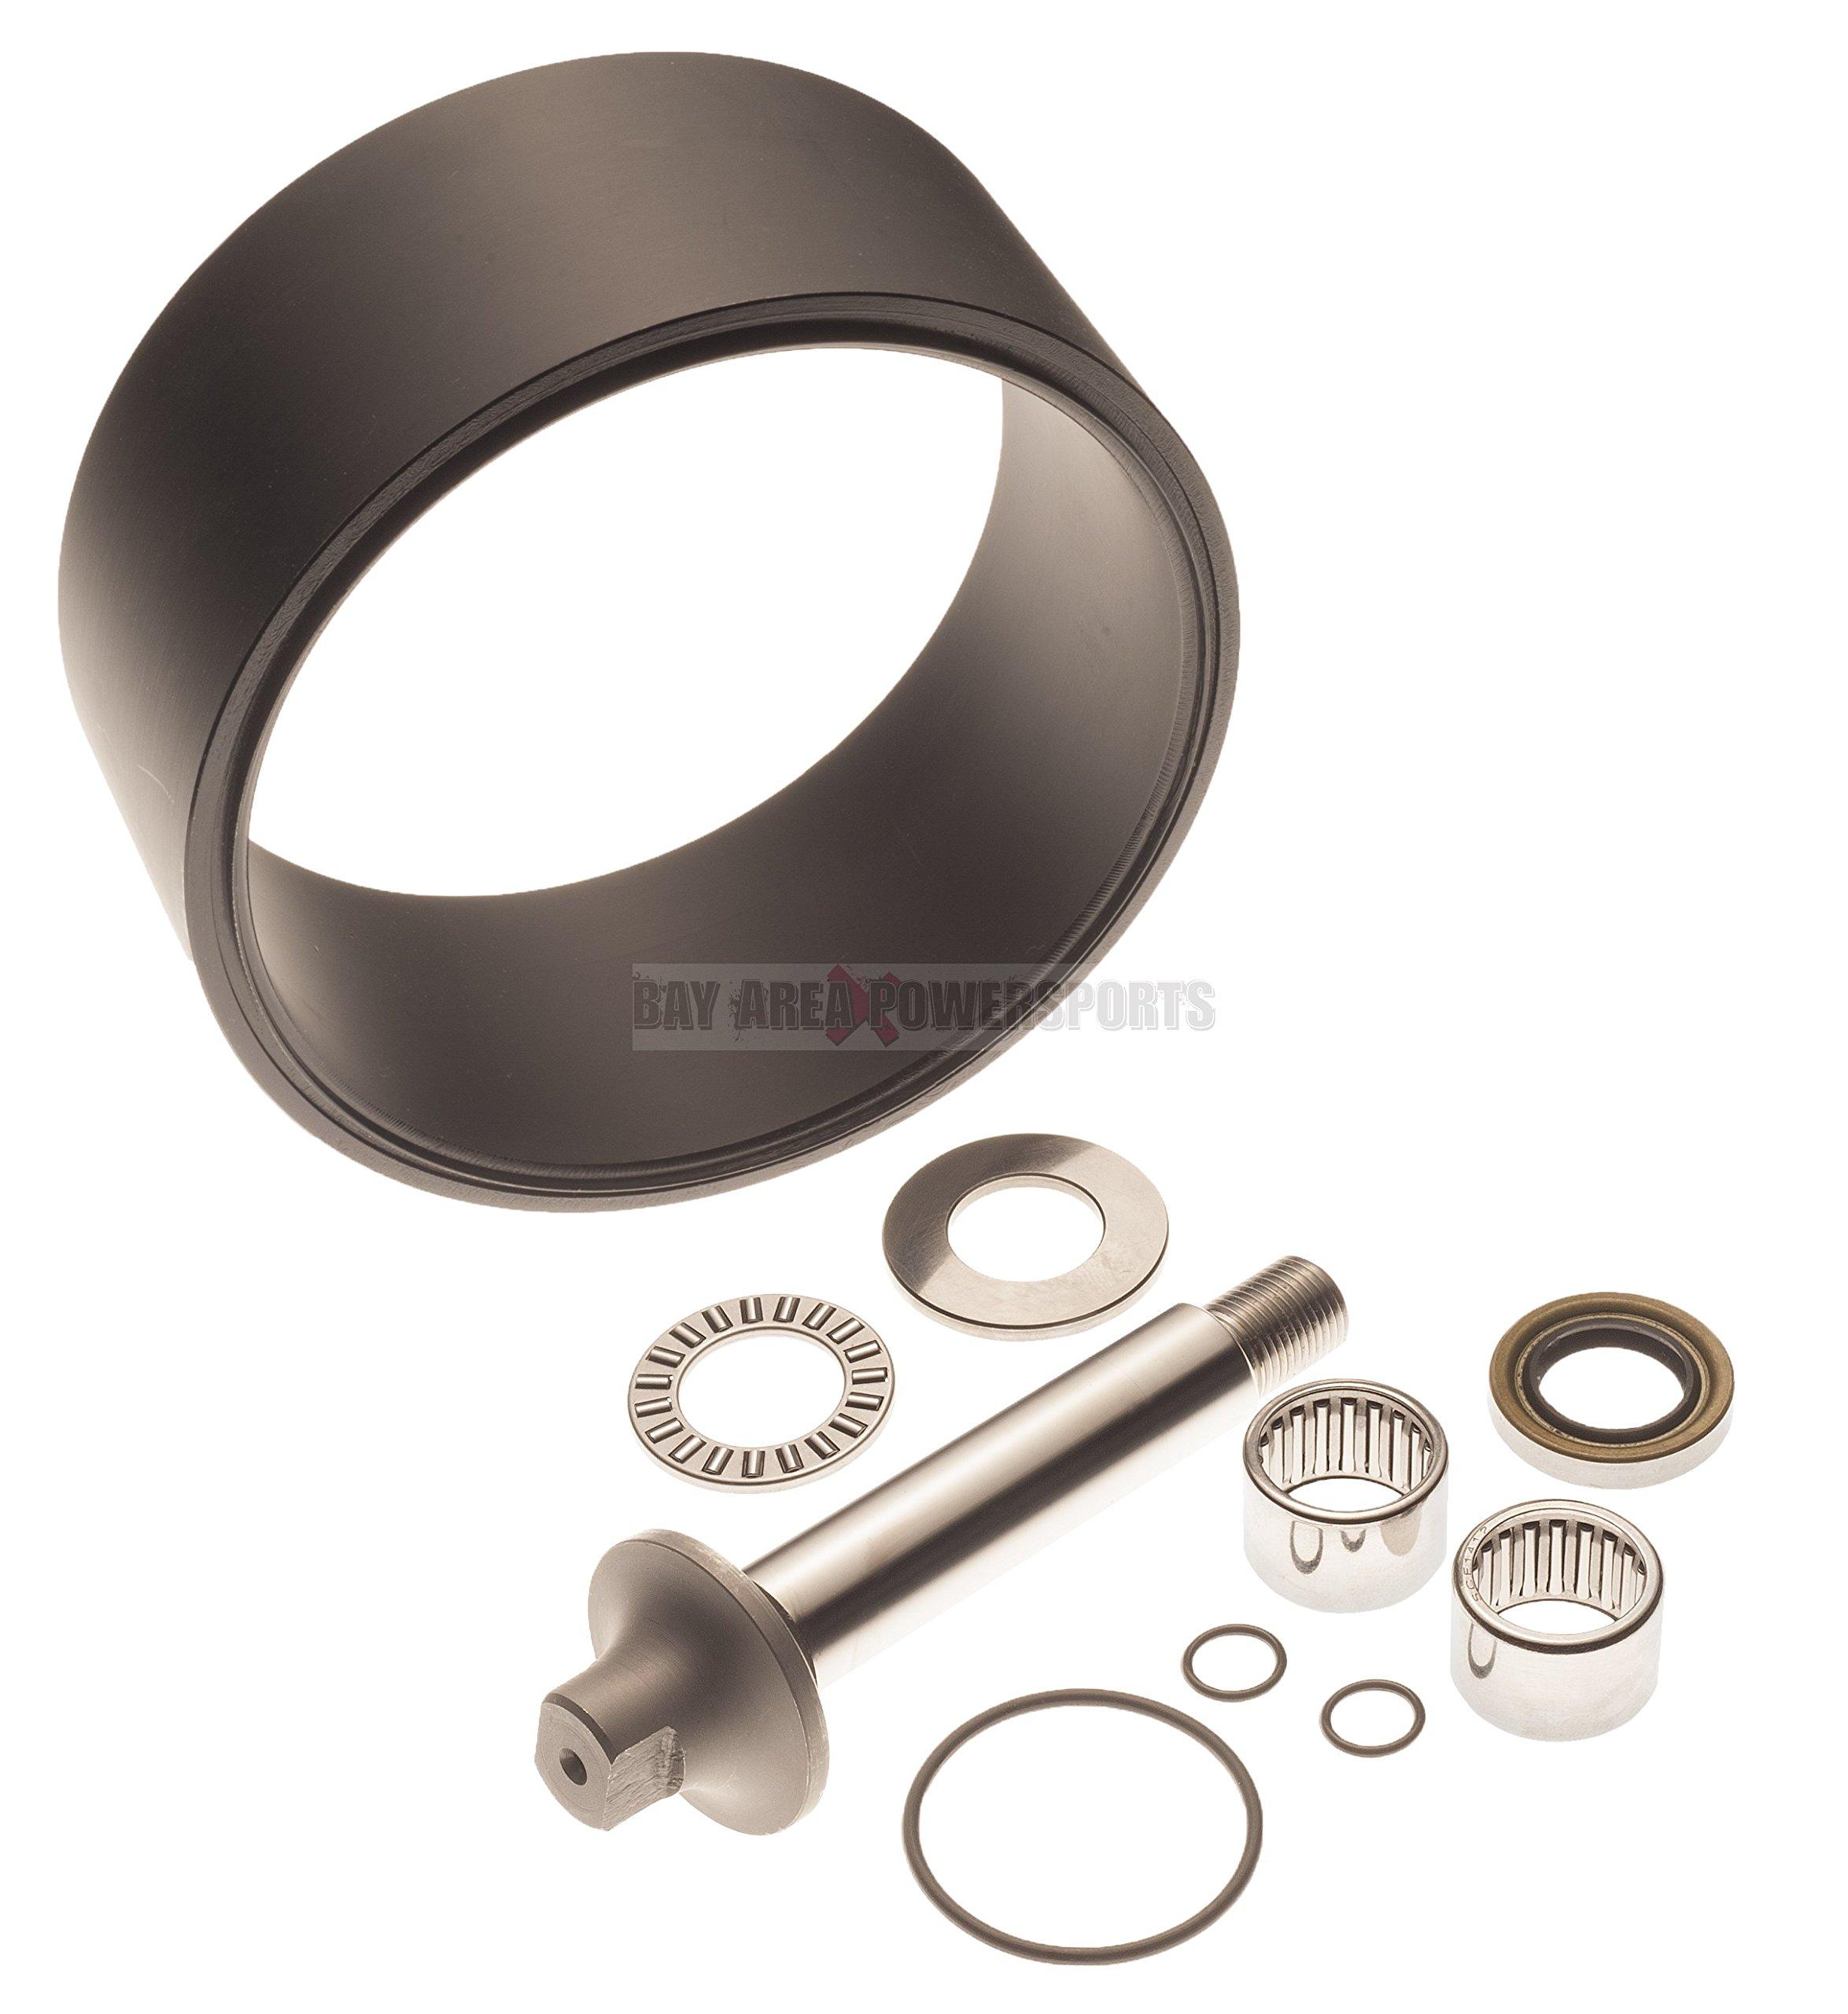 SeaDoo Complete Pump Rebuild Kit Wear Ring Shaft Bearing 717 720 GS HX GSI SP by Aftermarket SeaDoo